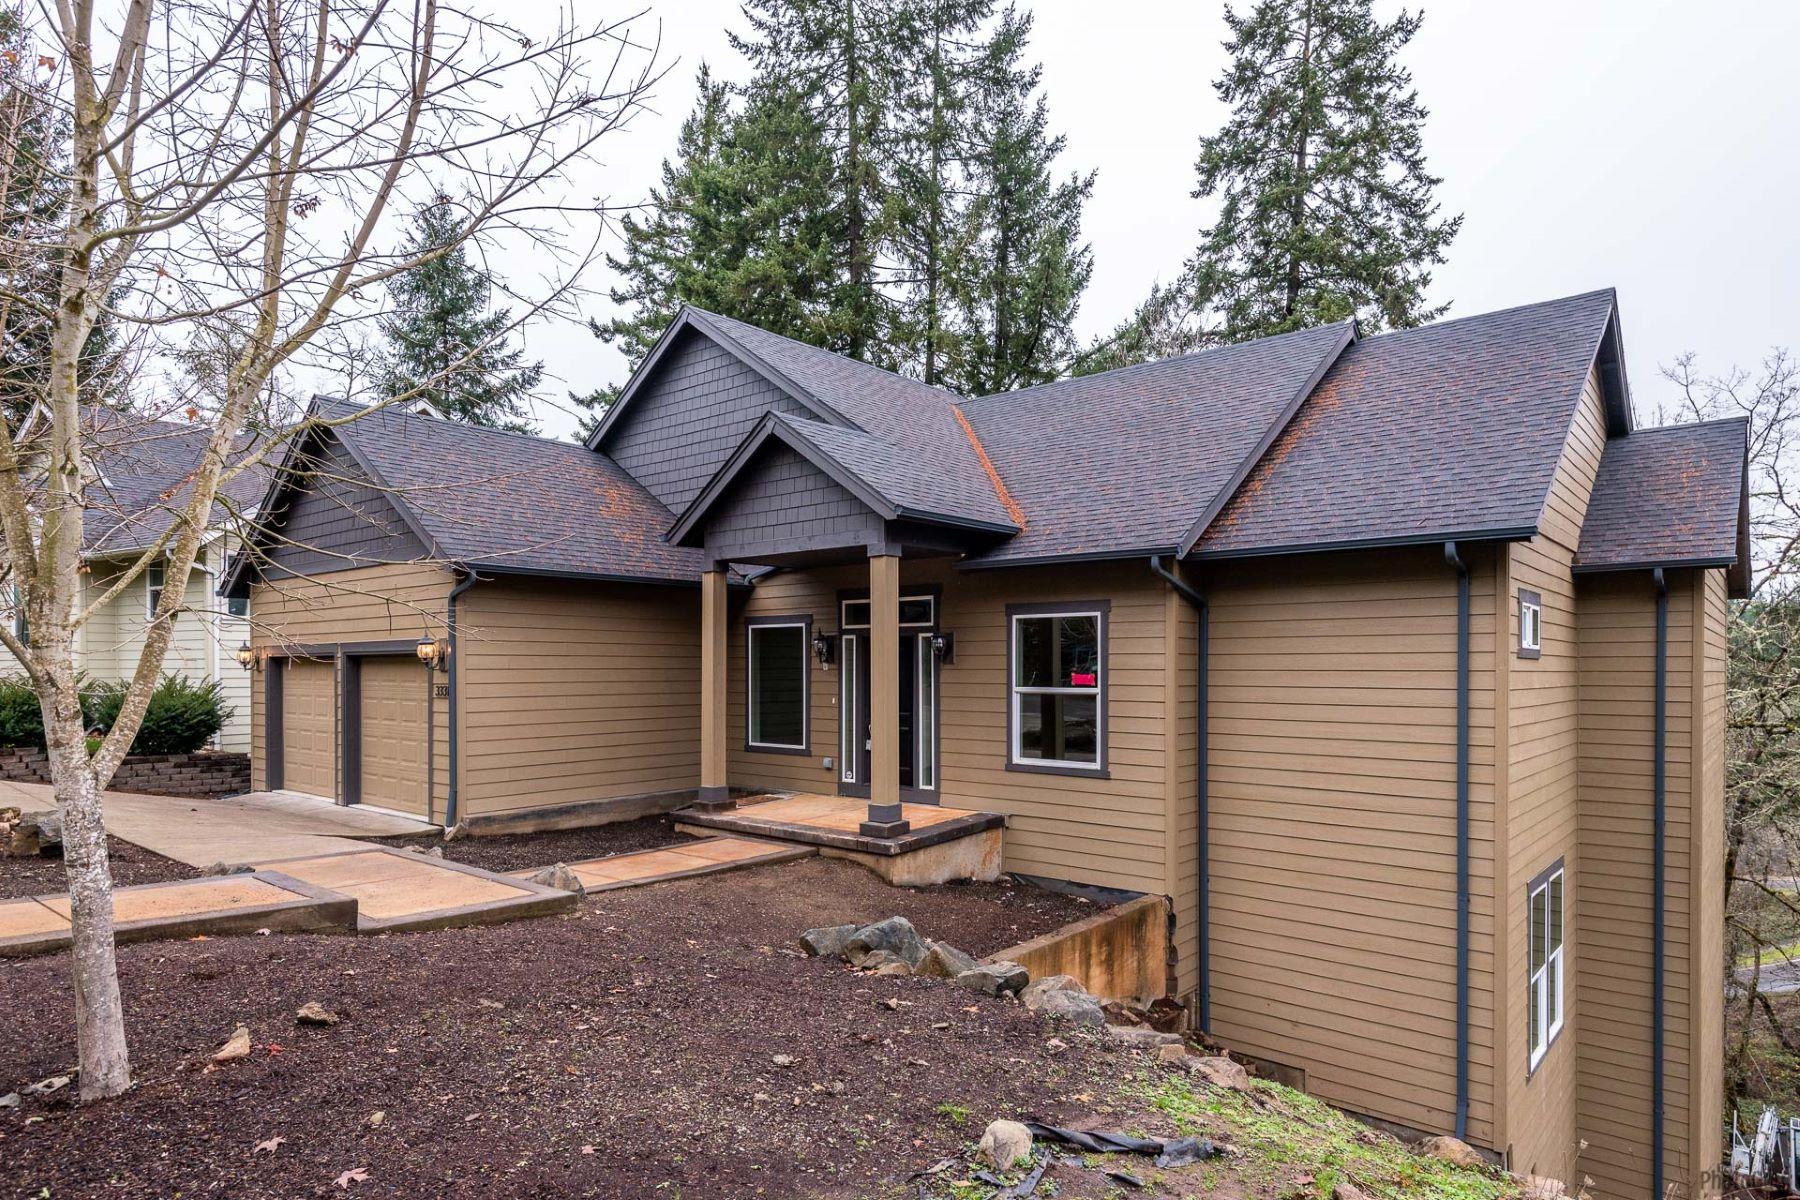 Other Residential Homes for Active at 3331 VIDERA DR Eugene, OR 97405 3331 VIDERA DR Eugene, Oregon 97405 United States